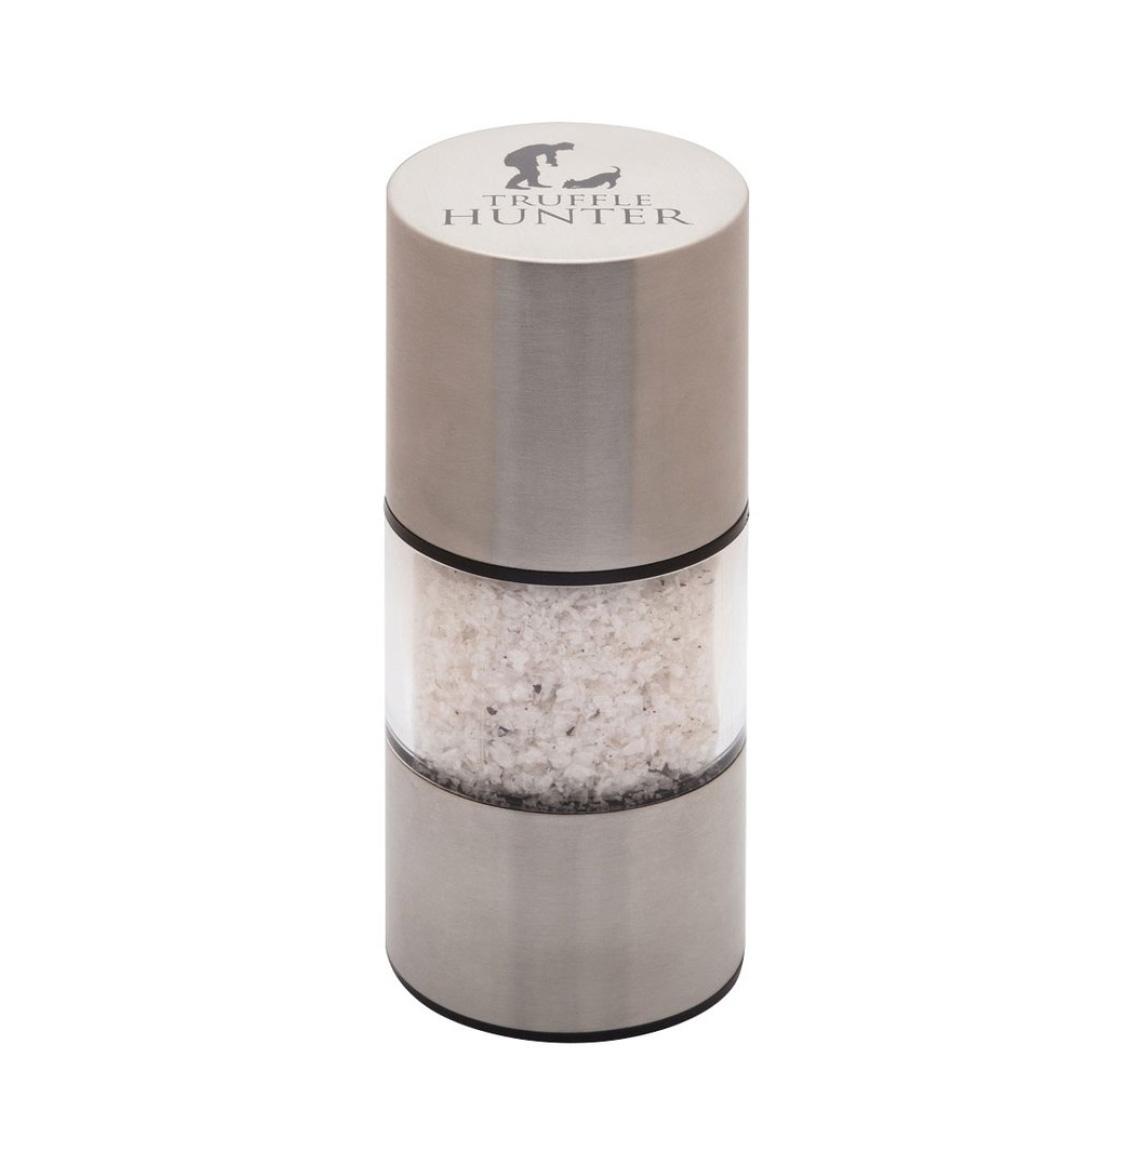 TruffleHunter Νιφάδες Αλατιού Με Μαύρη Τρούφα Σε Μύλο Flaked Black Truffle Sea Salt With Mill 40g